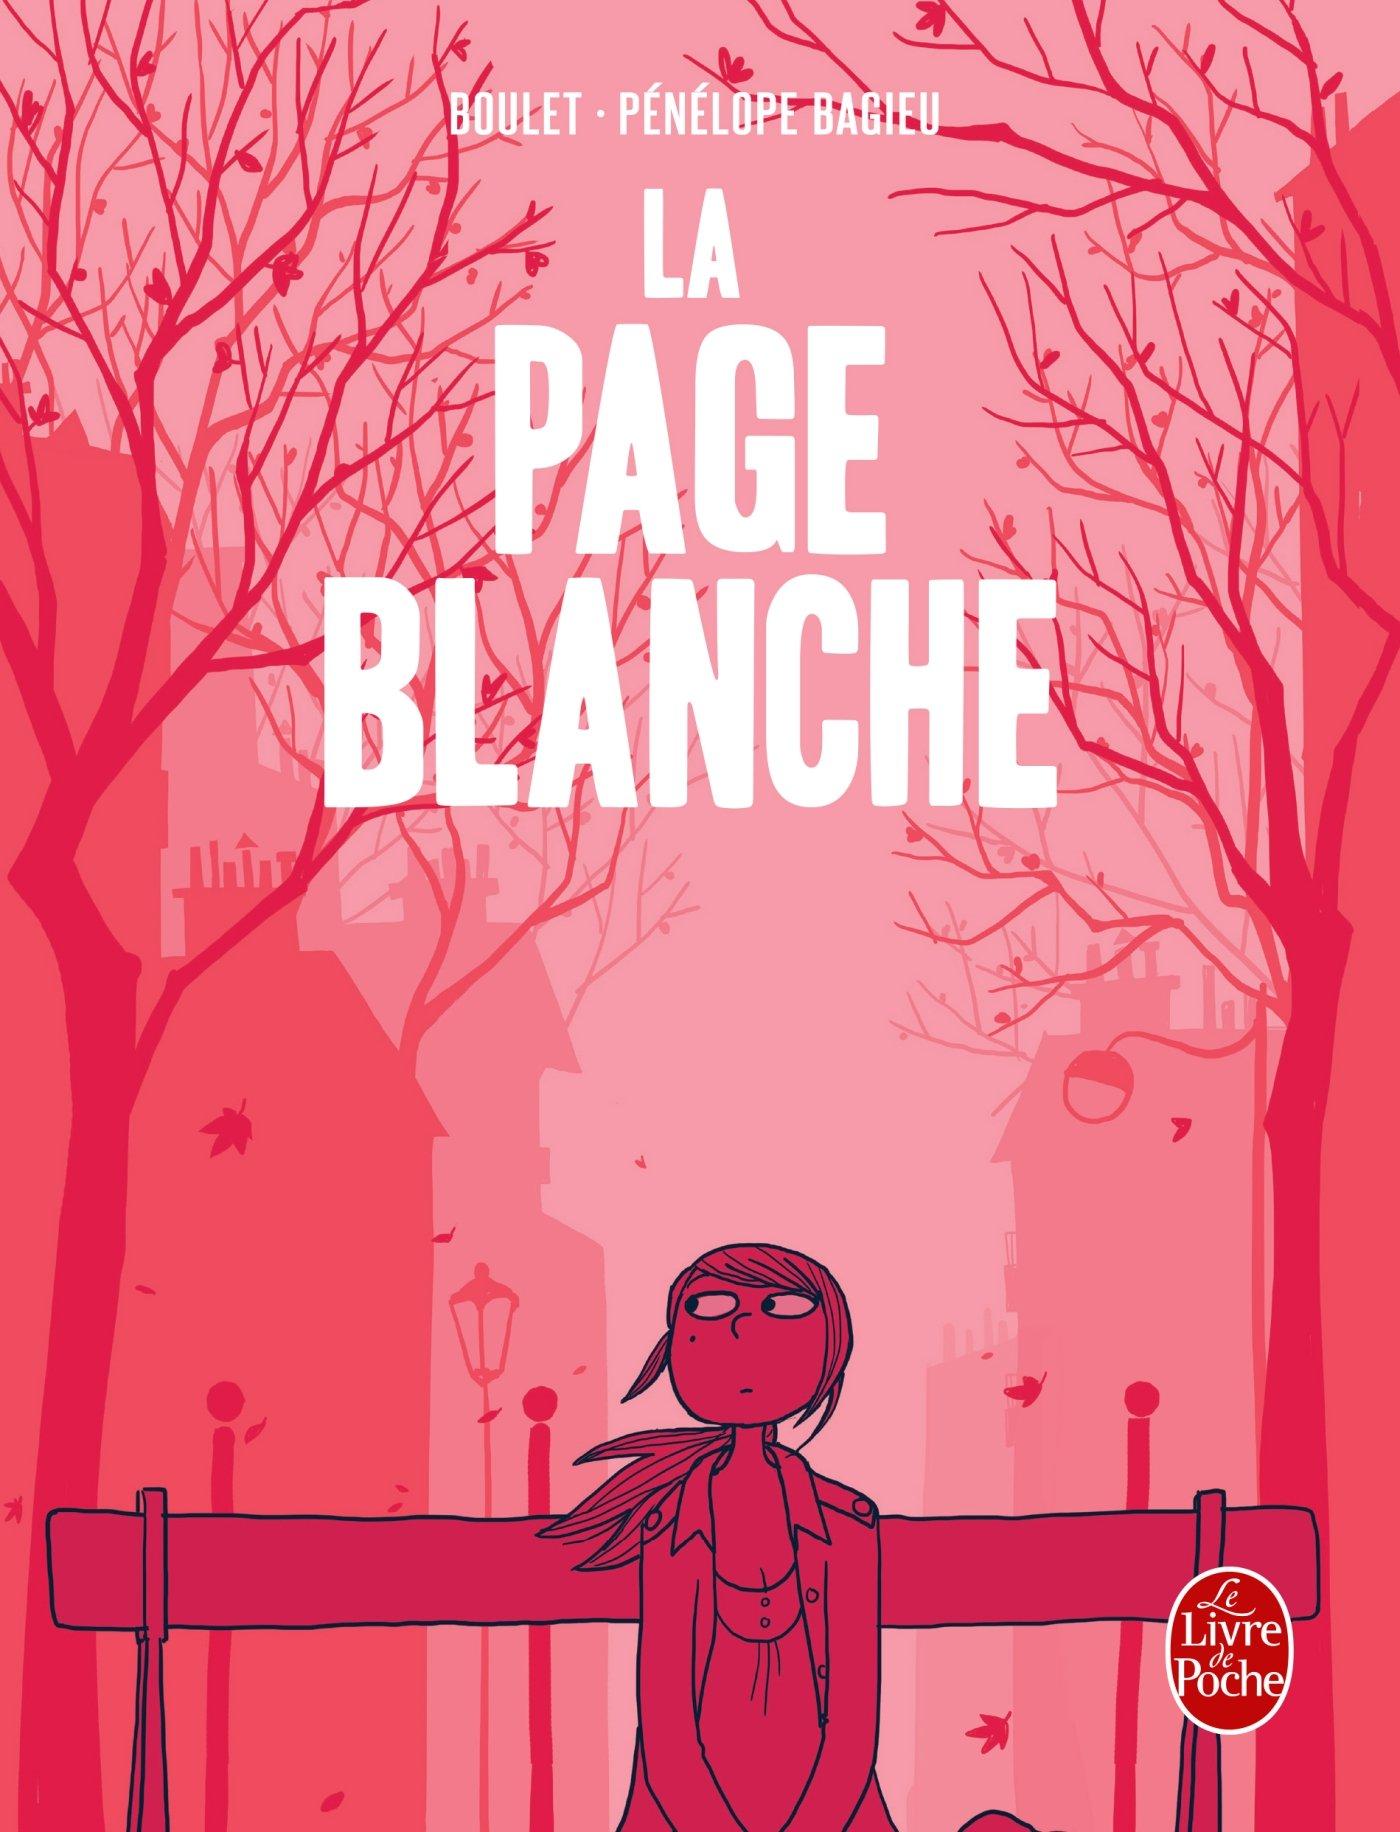 La page blanche de Pénélope Bagieu